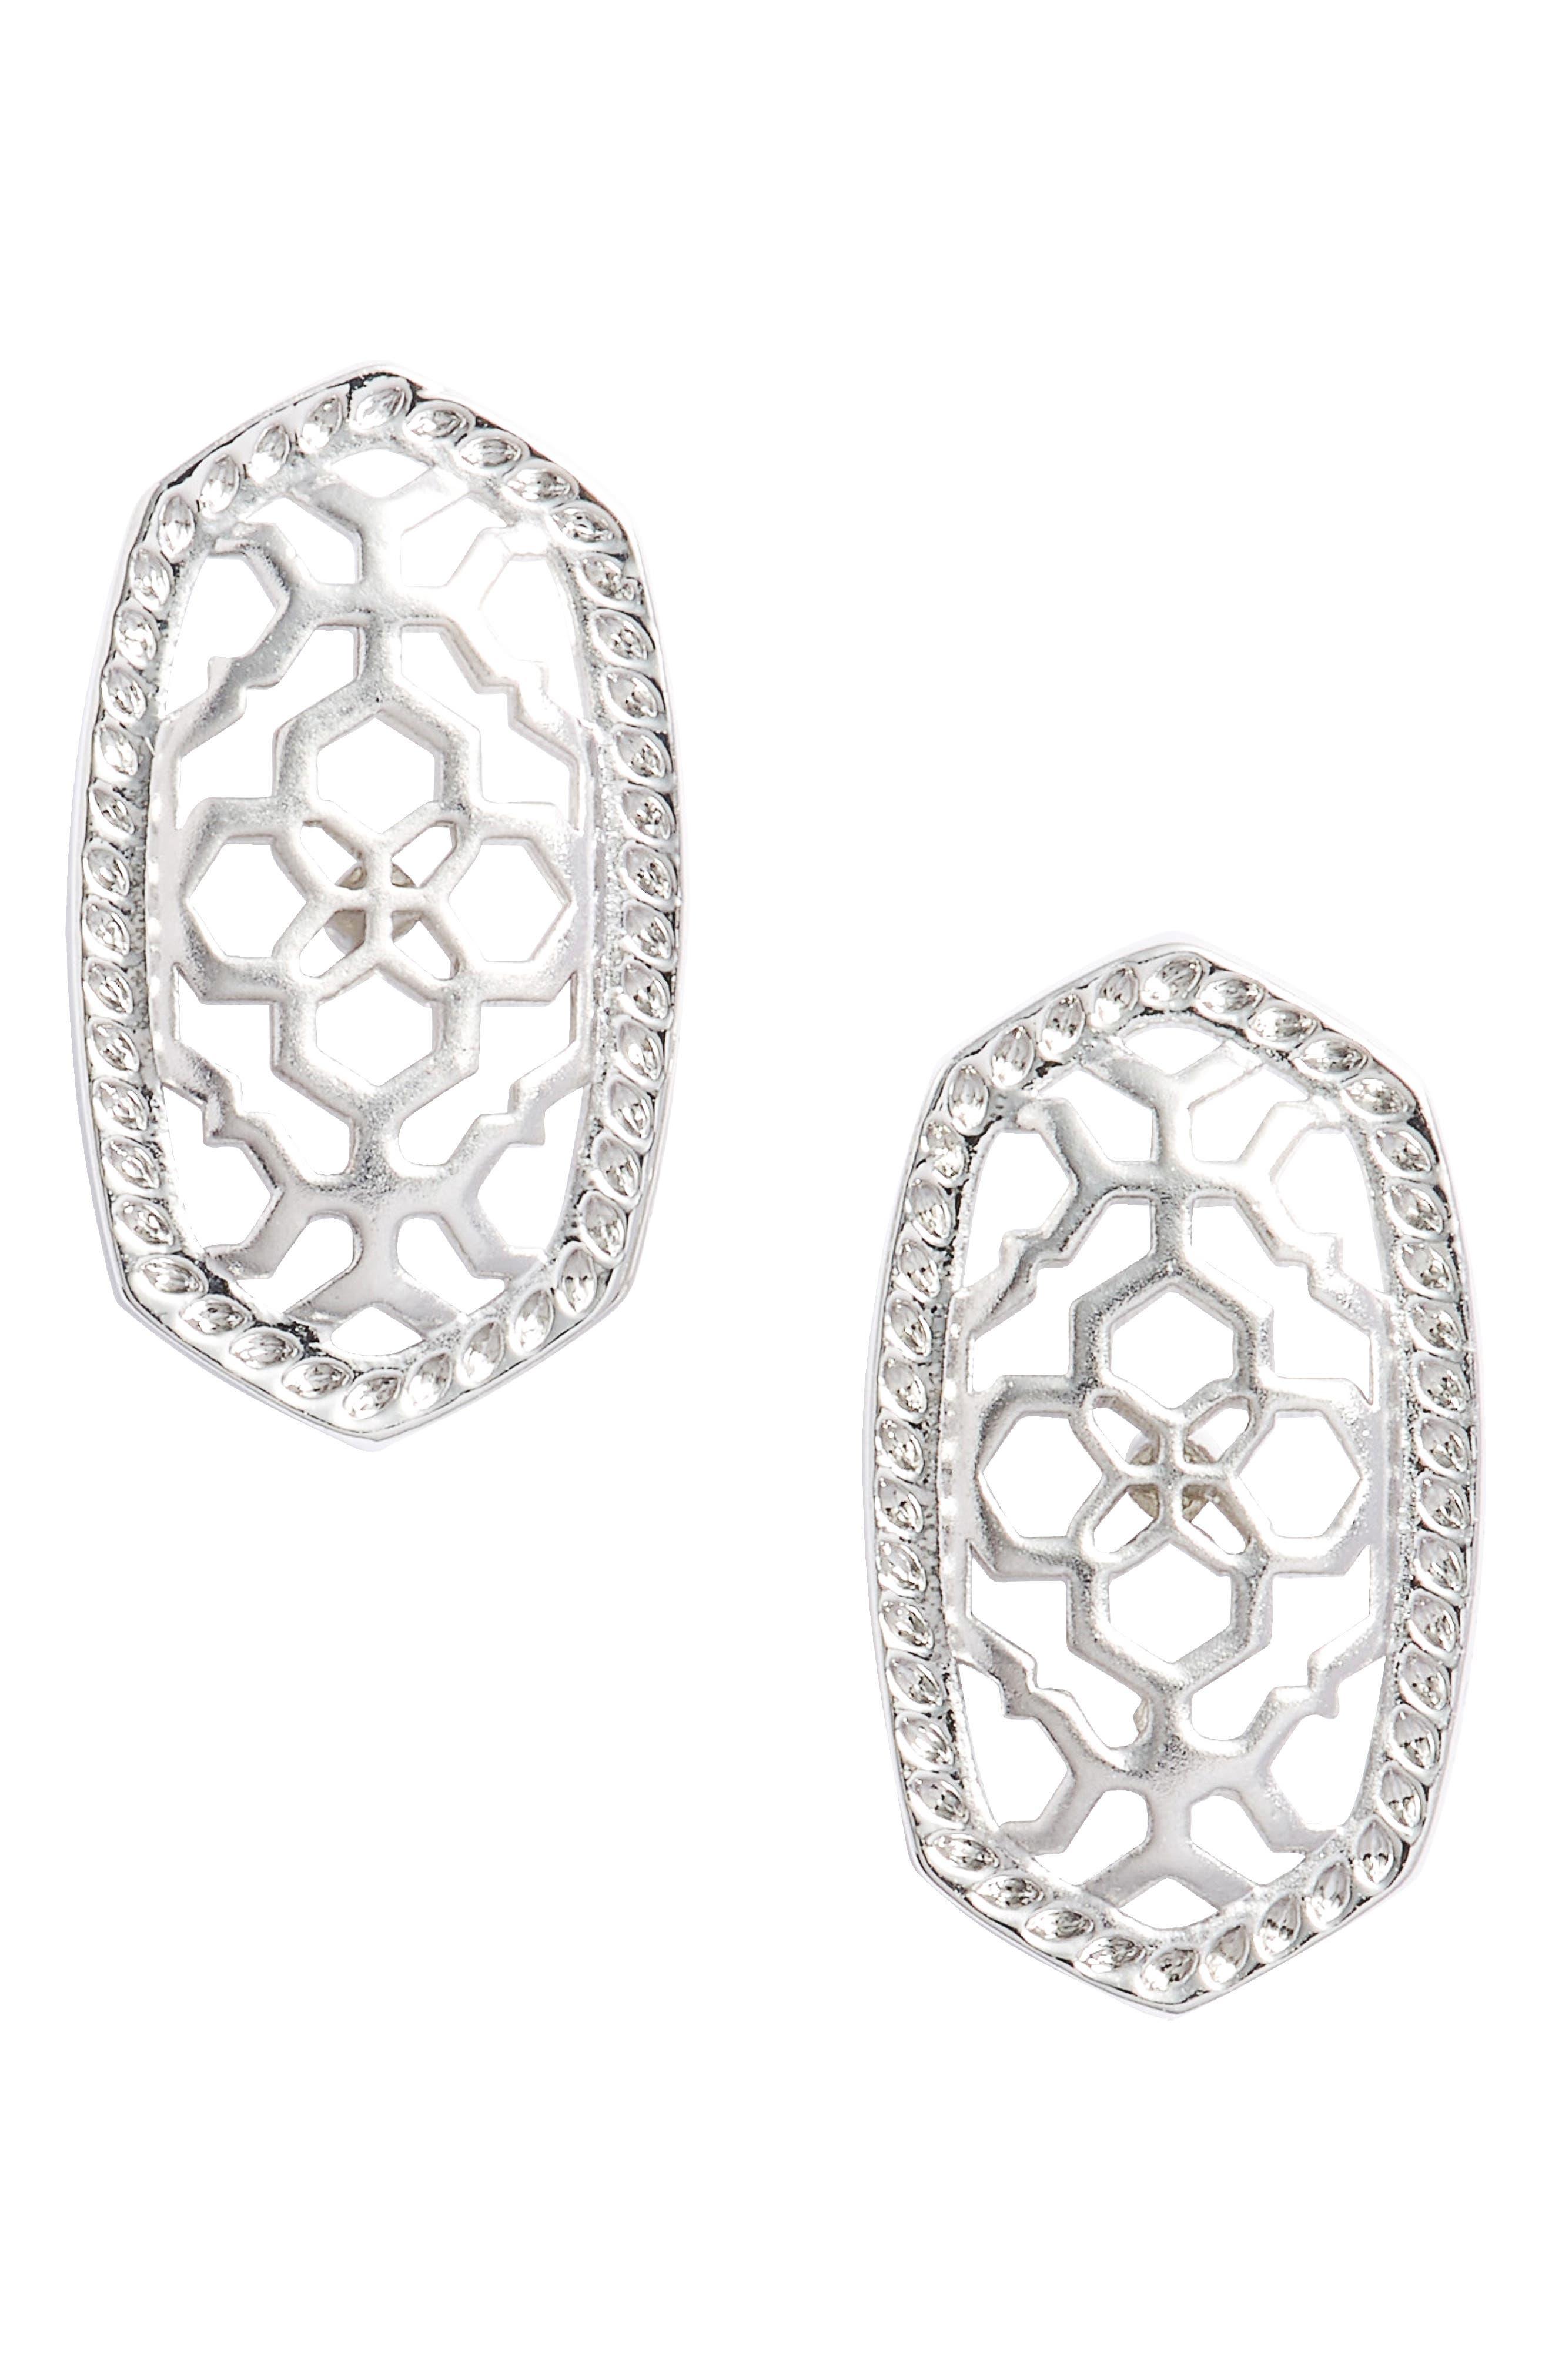 Ellie Oval Stud Earrings,                         Main,                         color, Silver